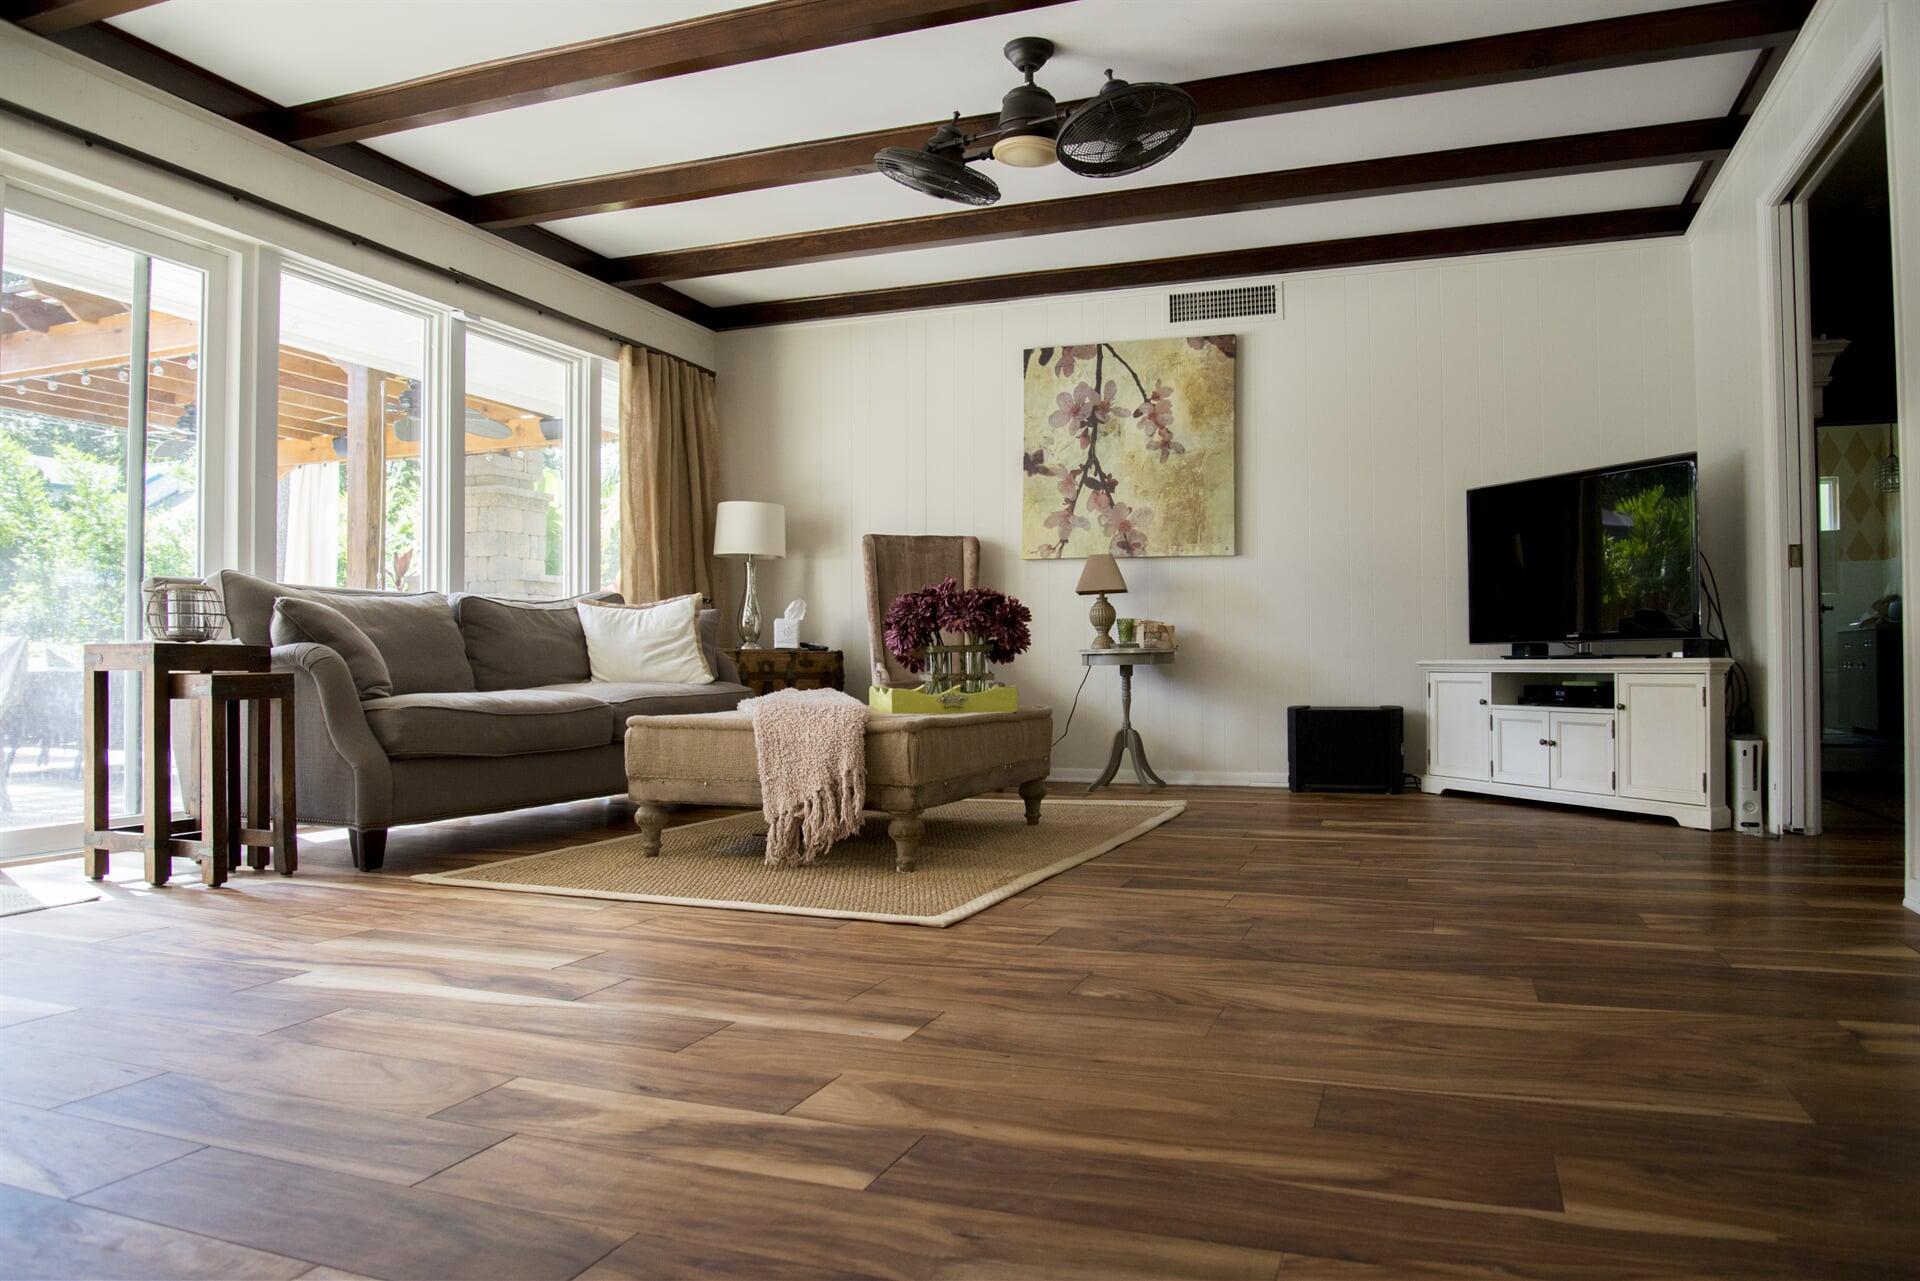 Acacia hardwood flooring in Tarpon Springs, FL from Floor Depot